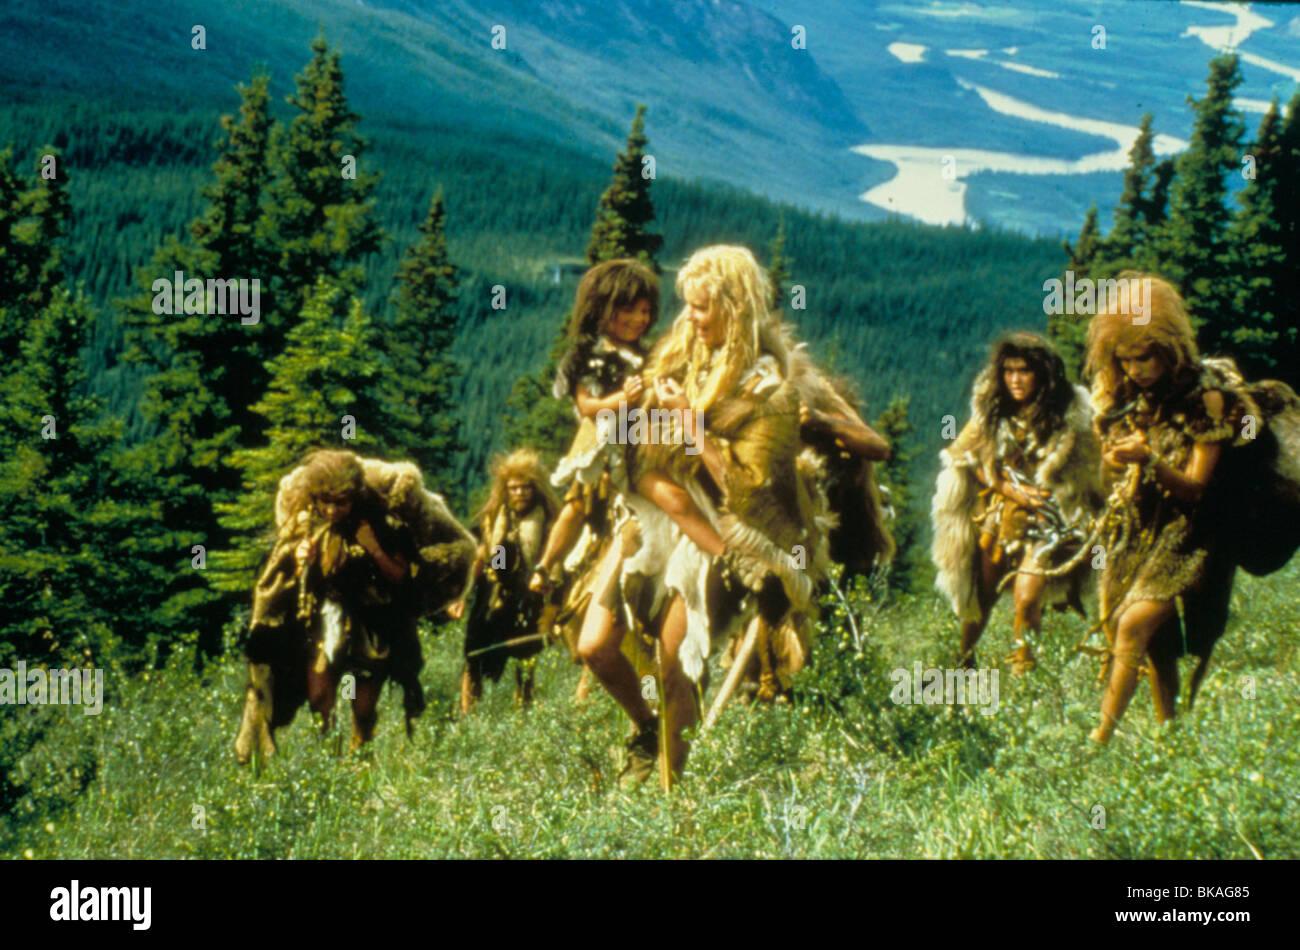 The Clan Of The Cave Bear 1986 Daryl Hannah Cvb 011 Stock Photo